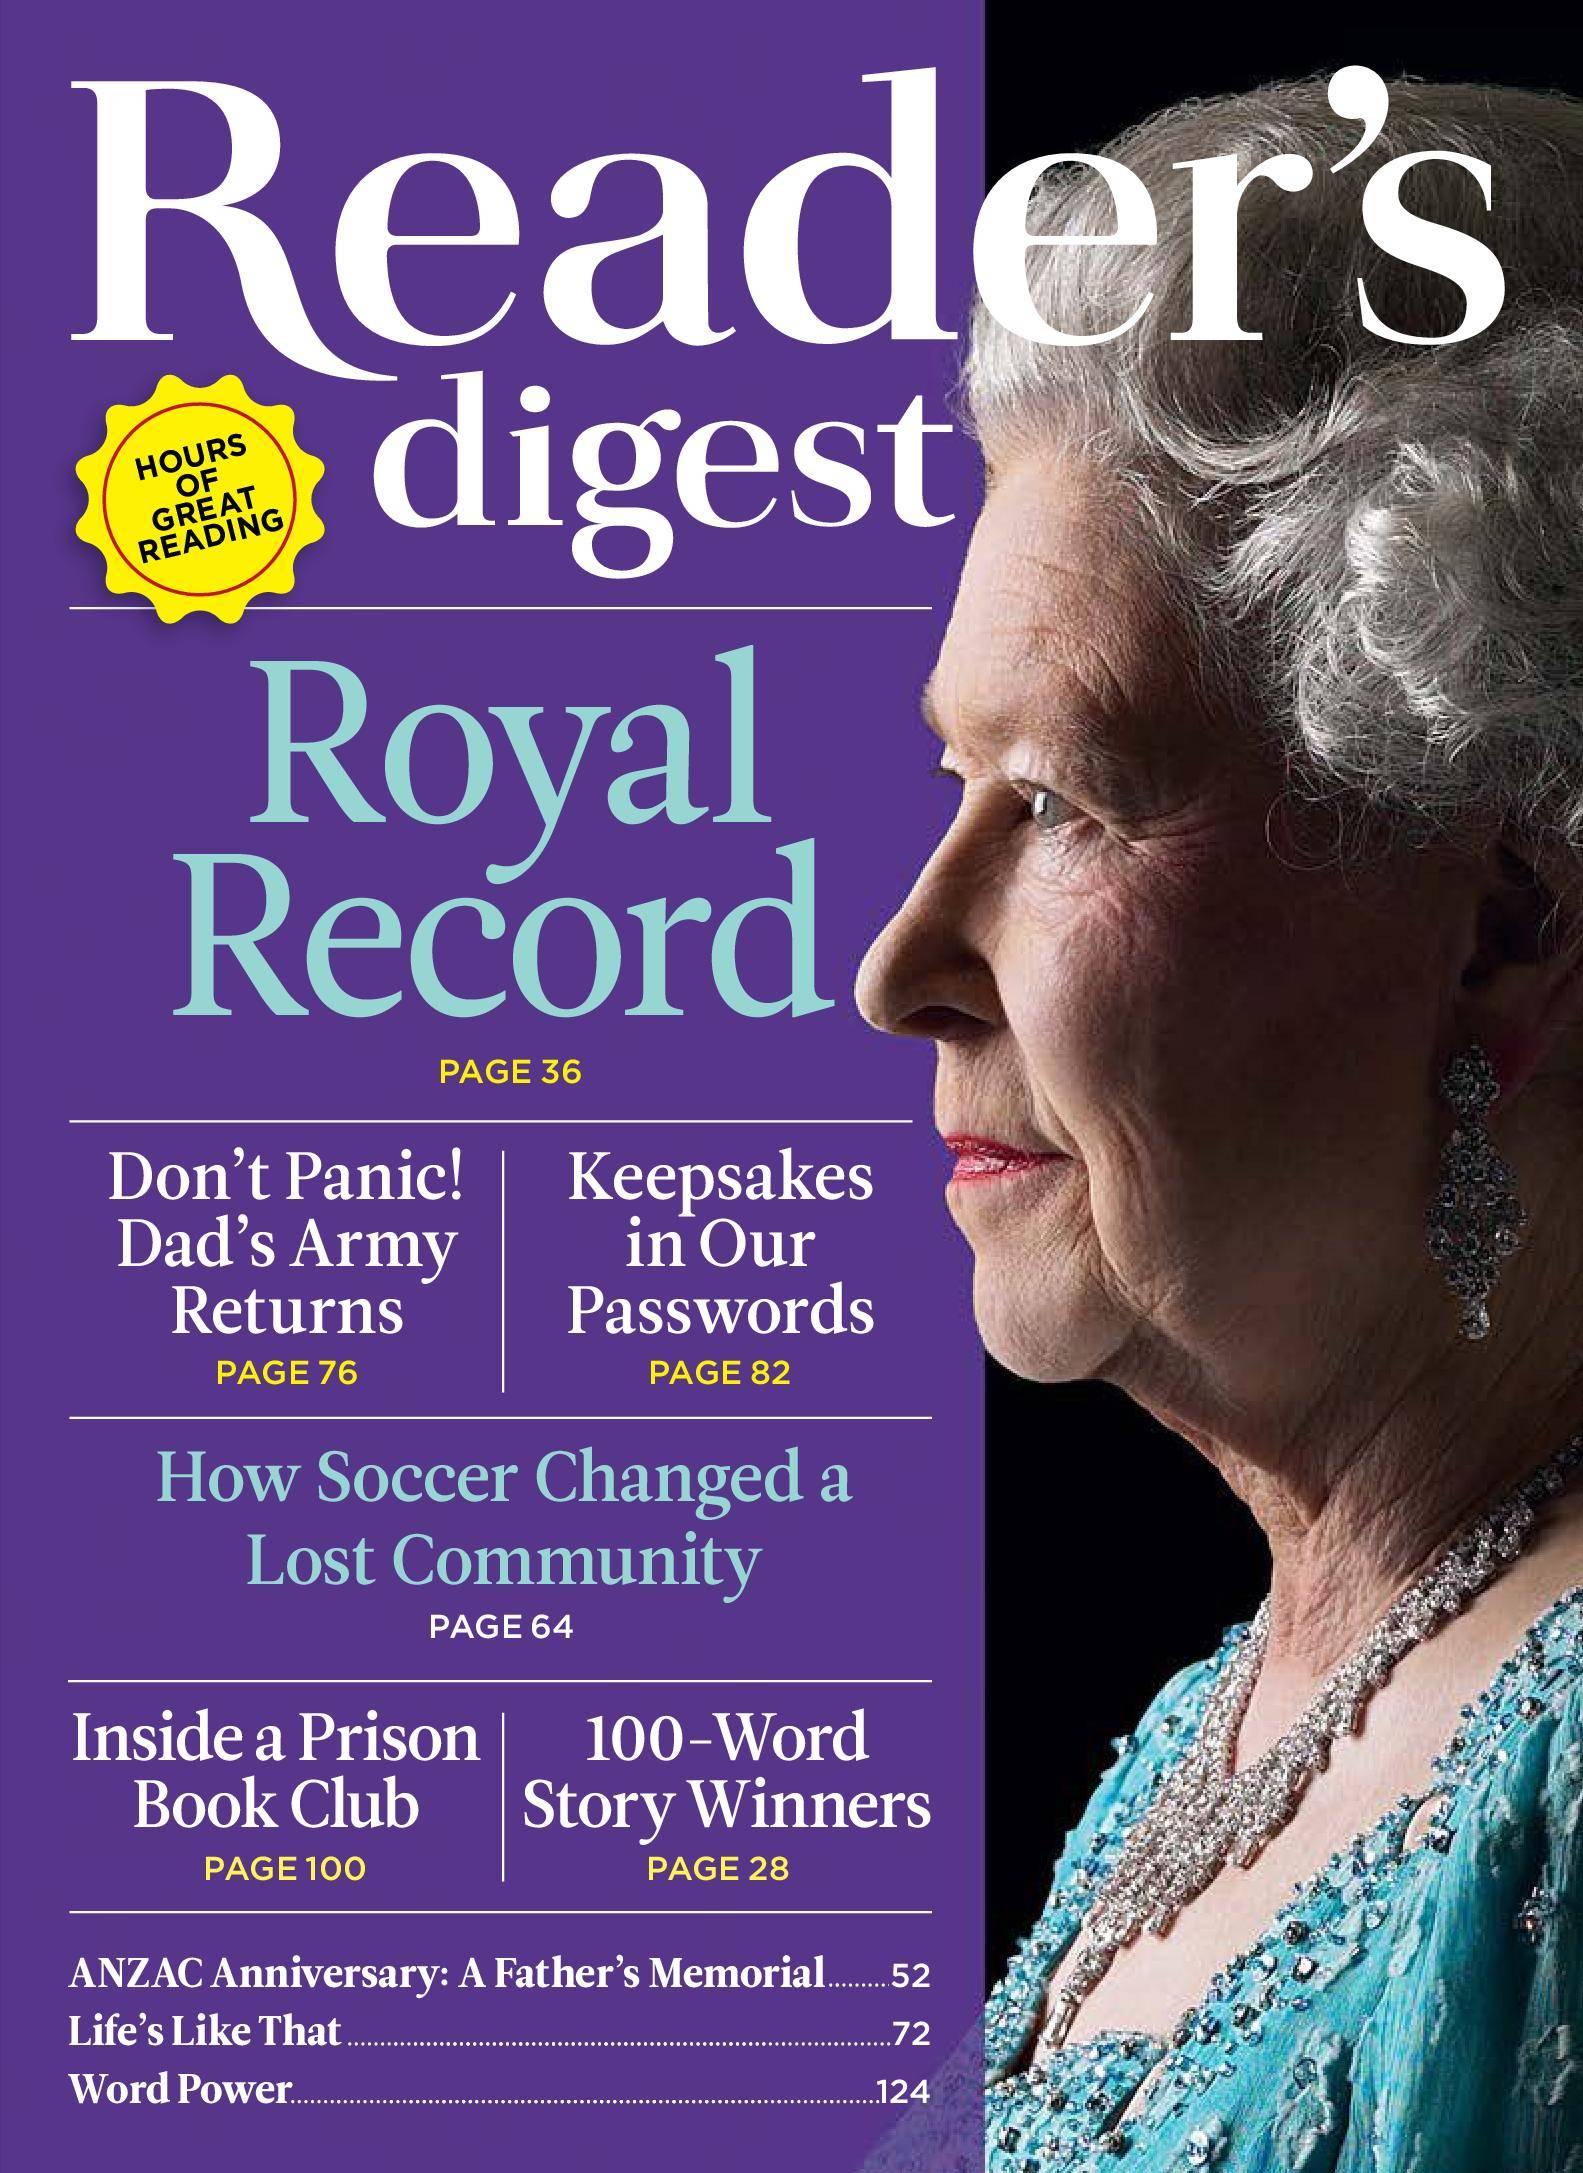 readers digest magzine 4 - HD1583×2173